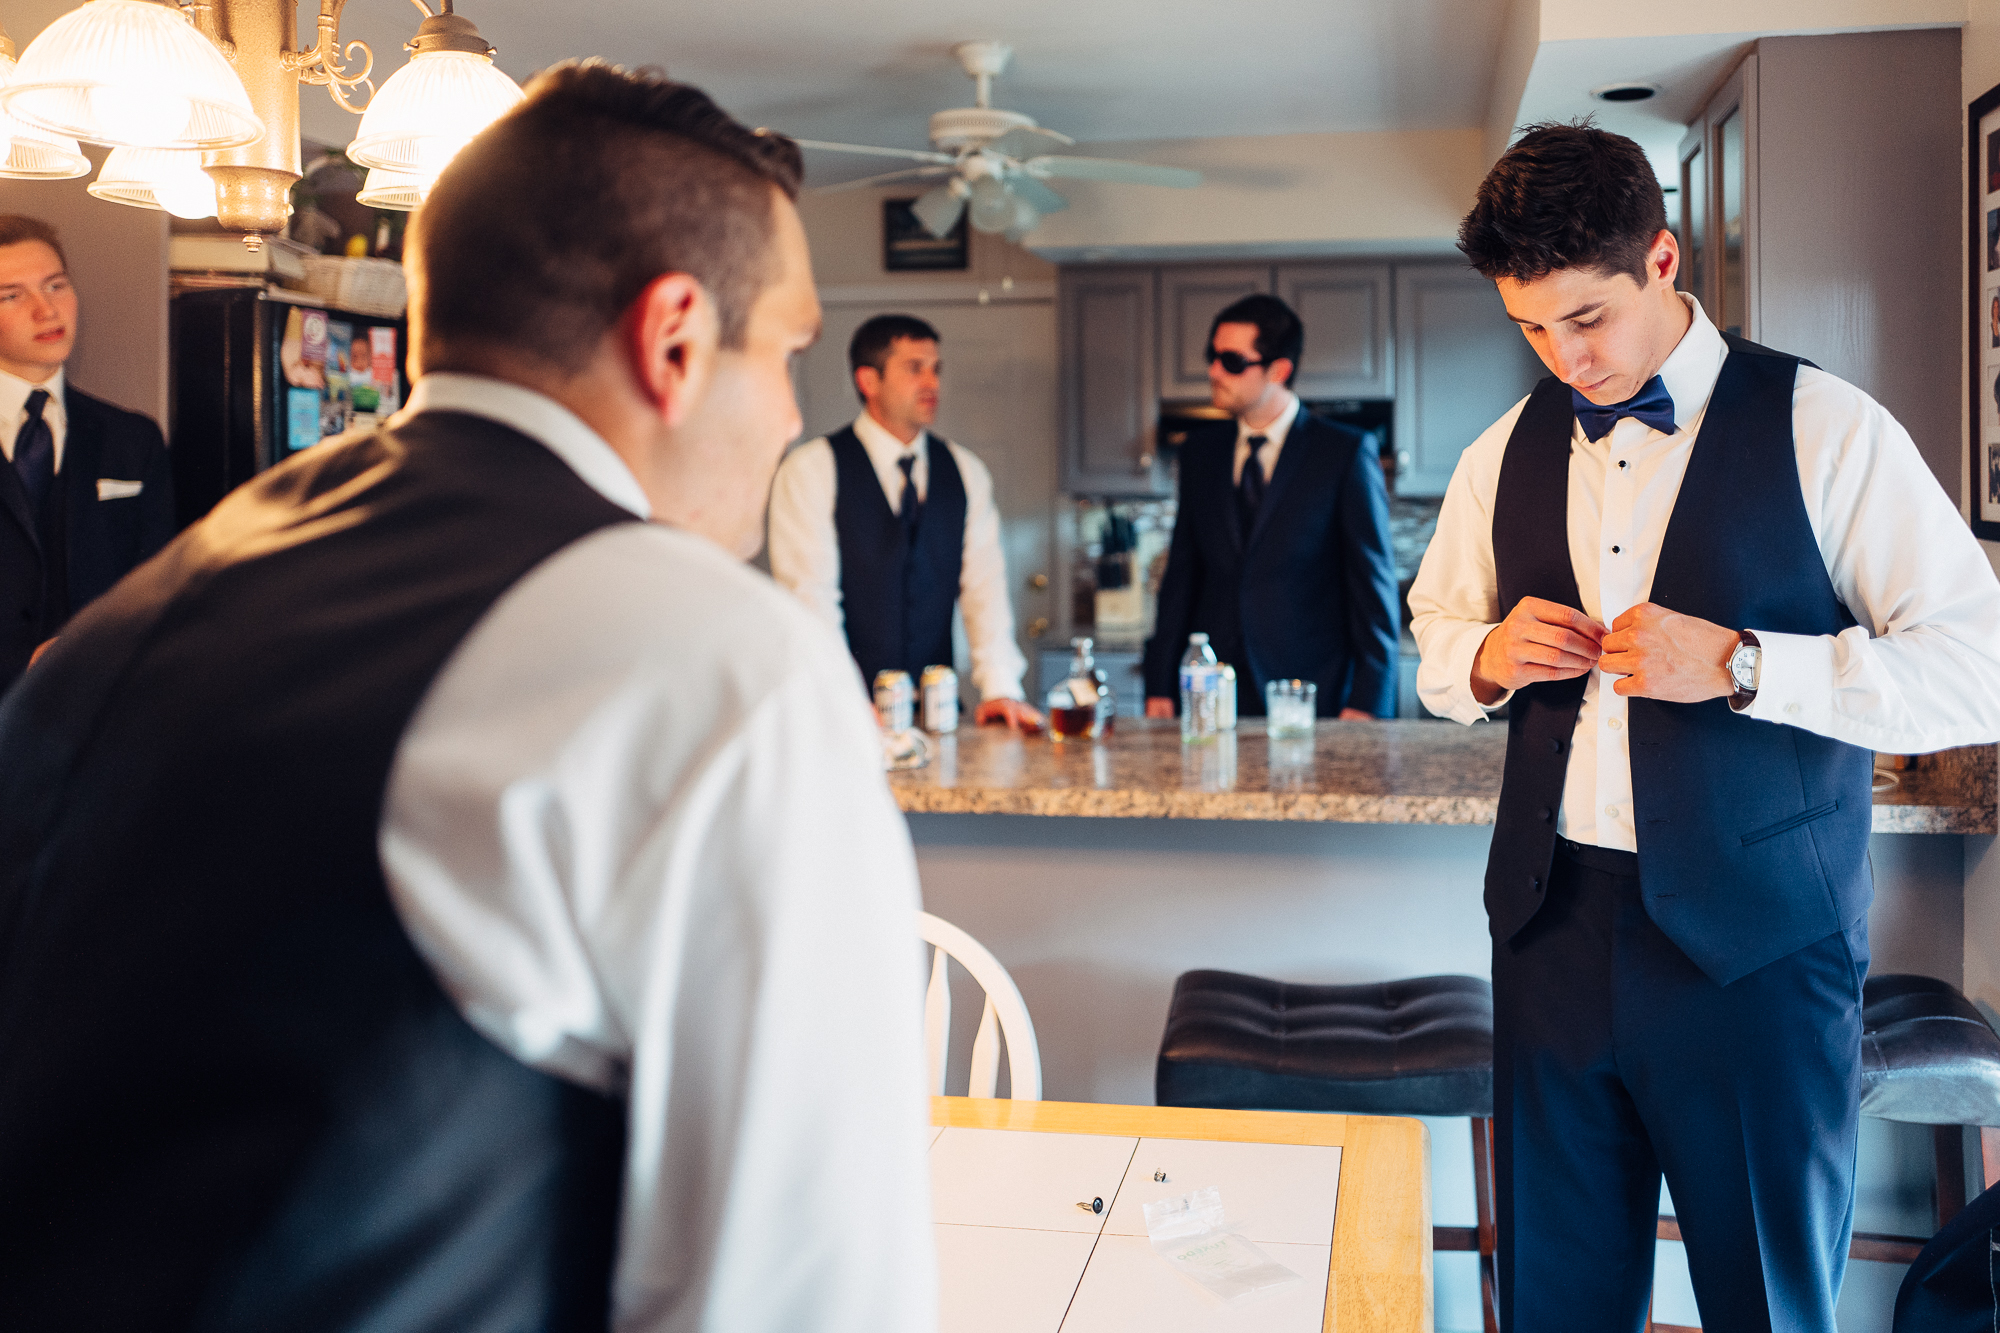 scranton-wedding-photography-zak-zavada-2016.06-rebeccaIan-0042.jpg